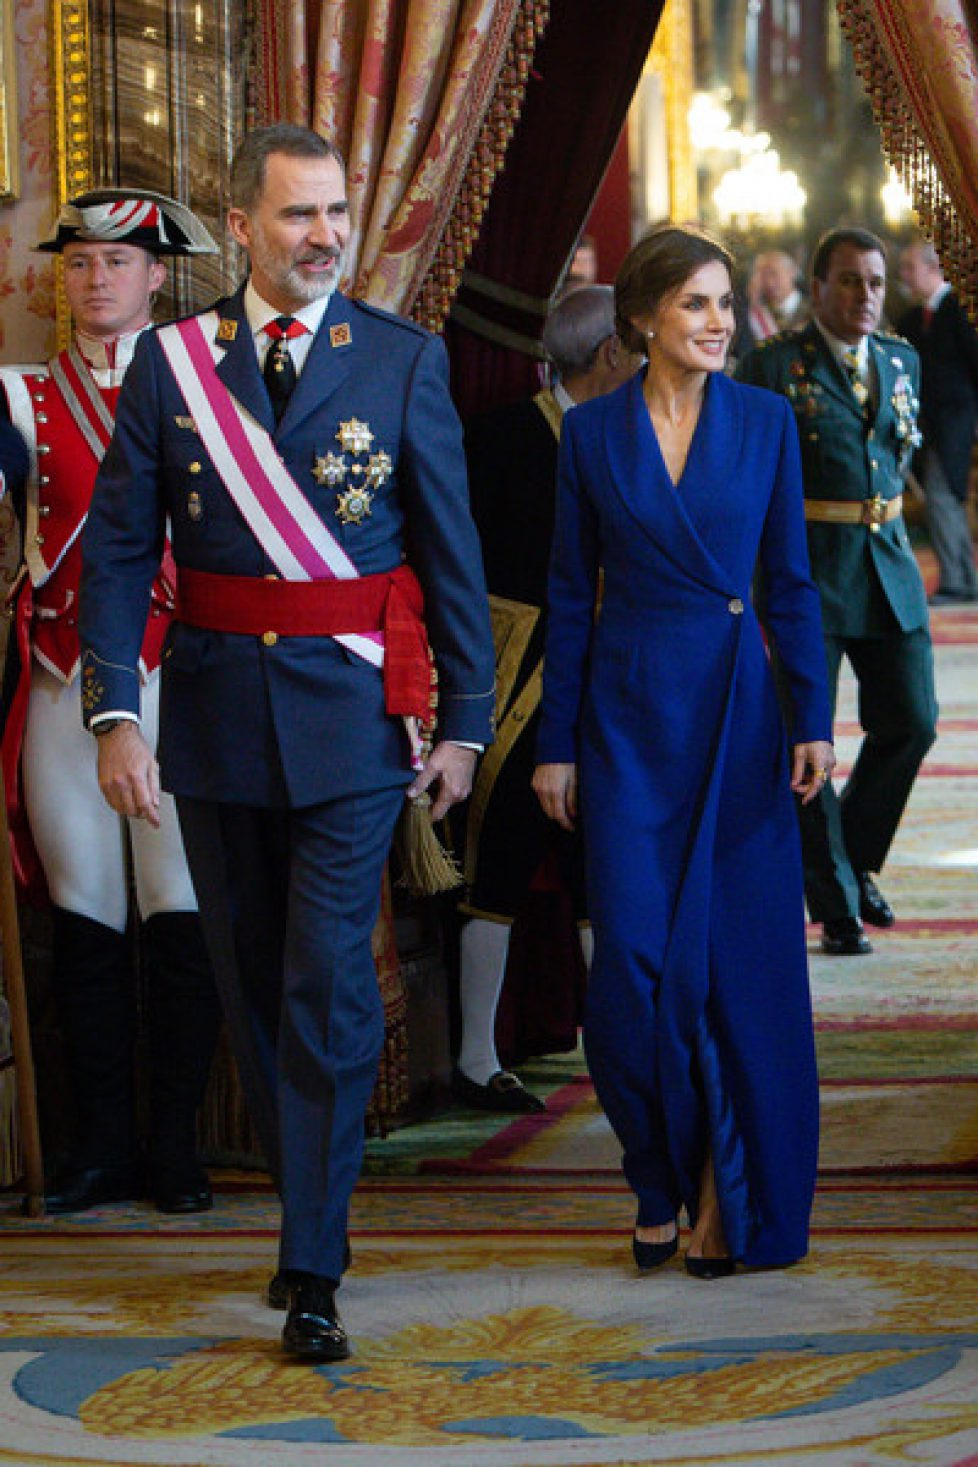 Spanish+Royals+Celebrate+New+Year+Military+3N2YgmYjr7Rl